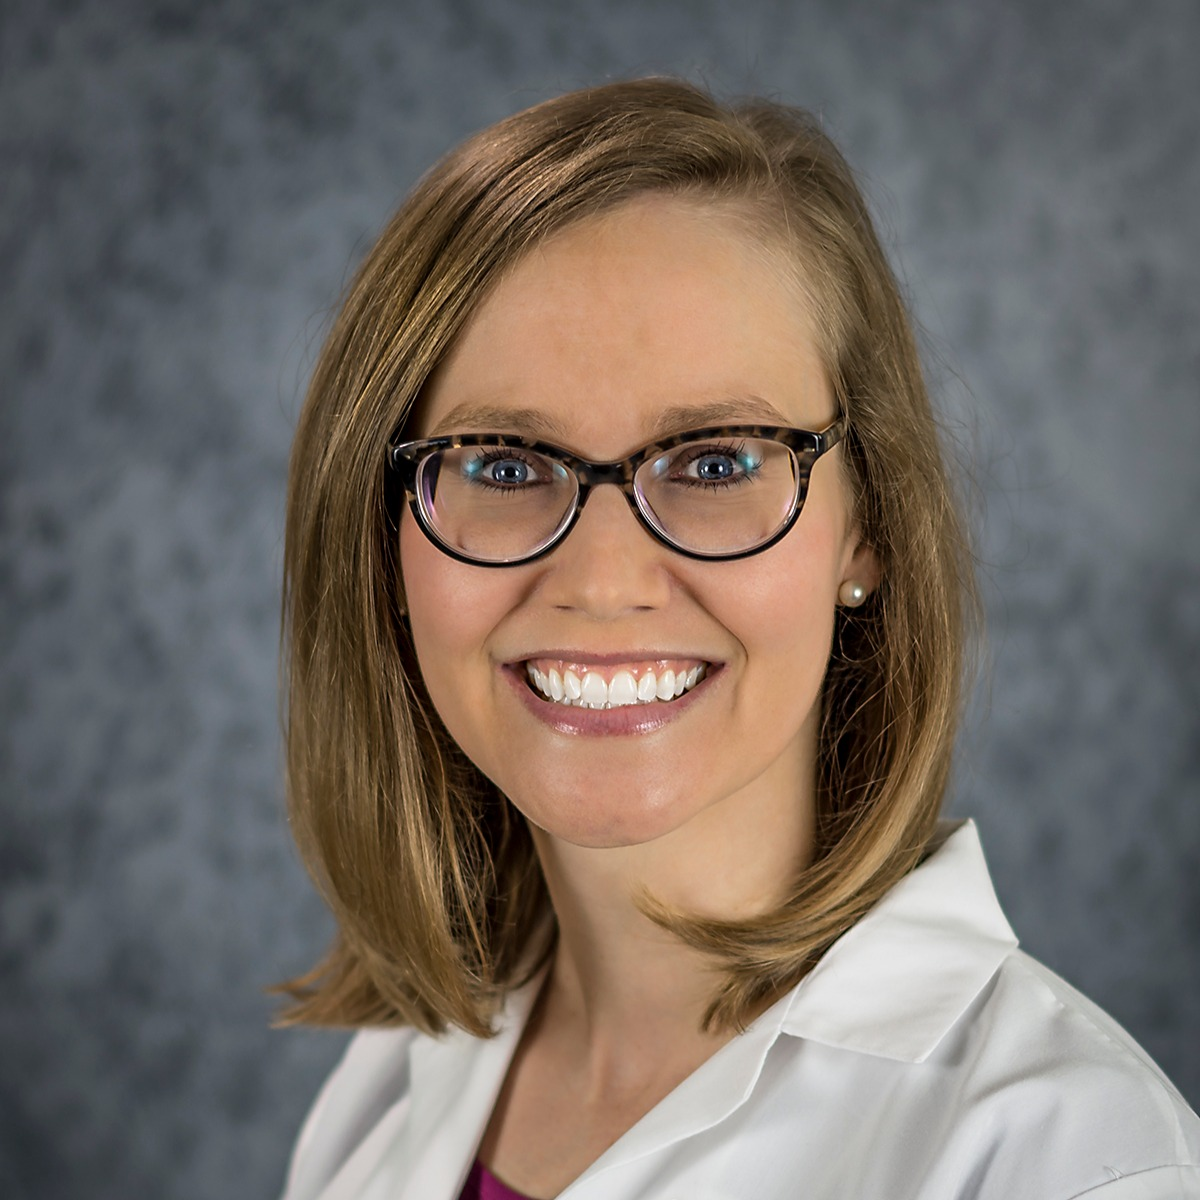 Sarah Storm Gross, MD